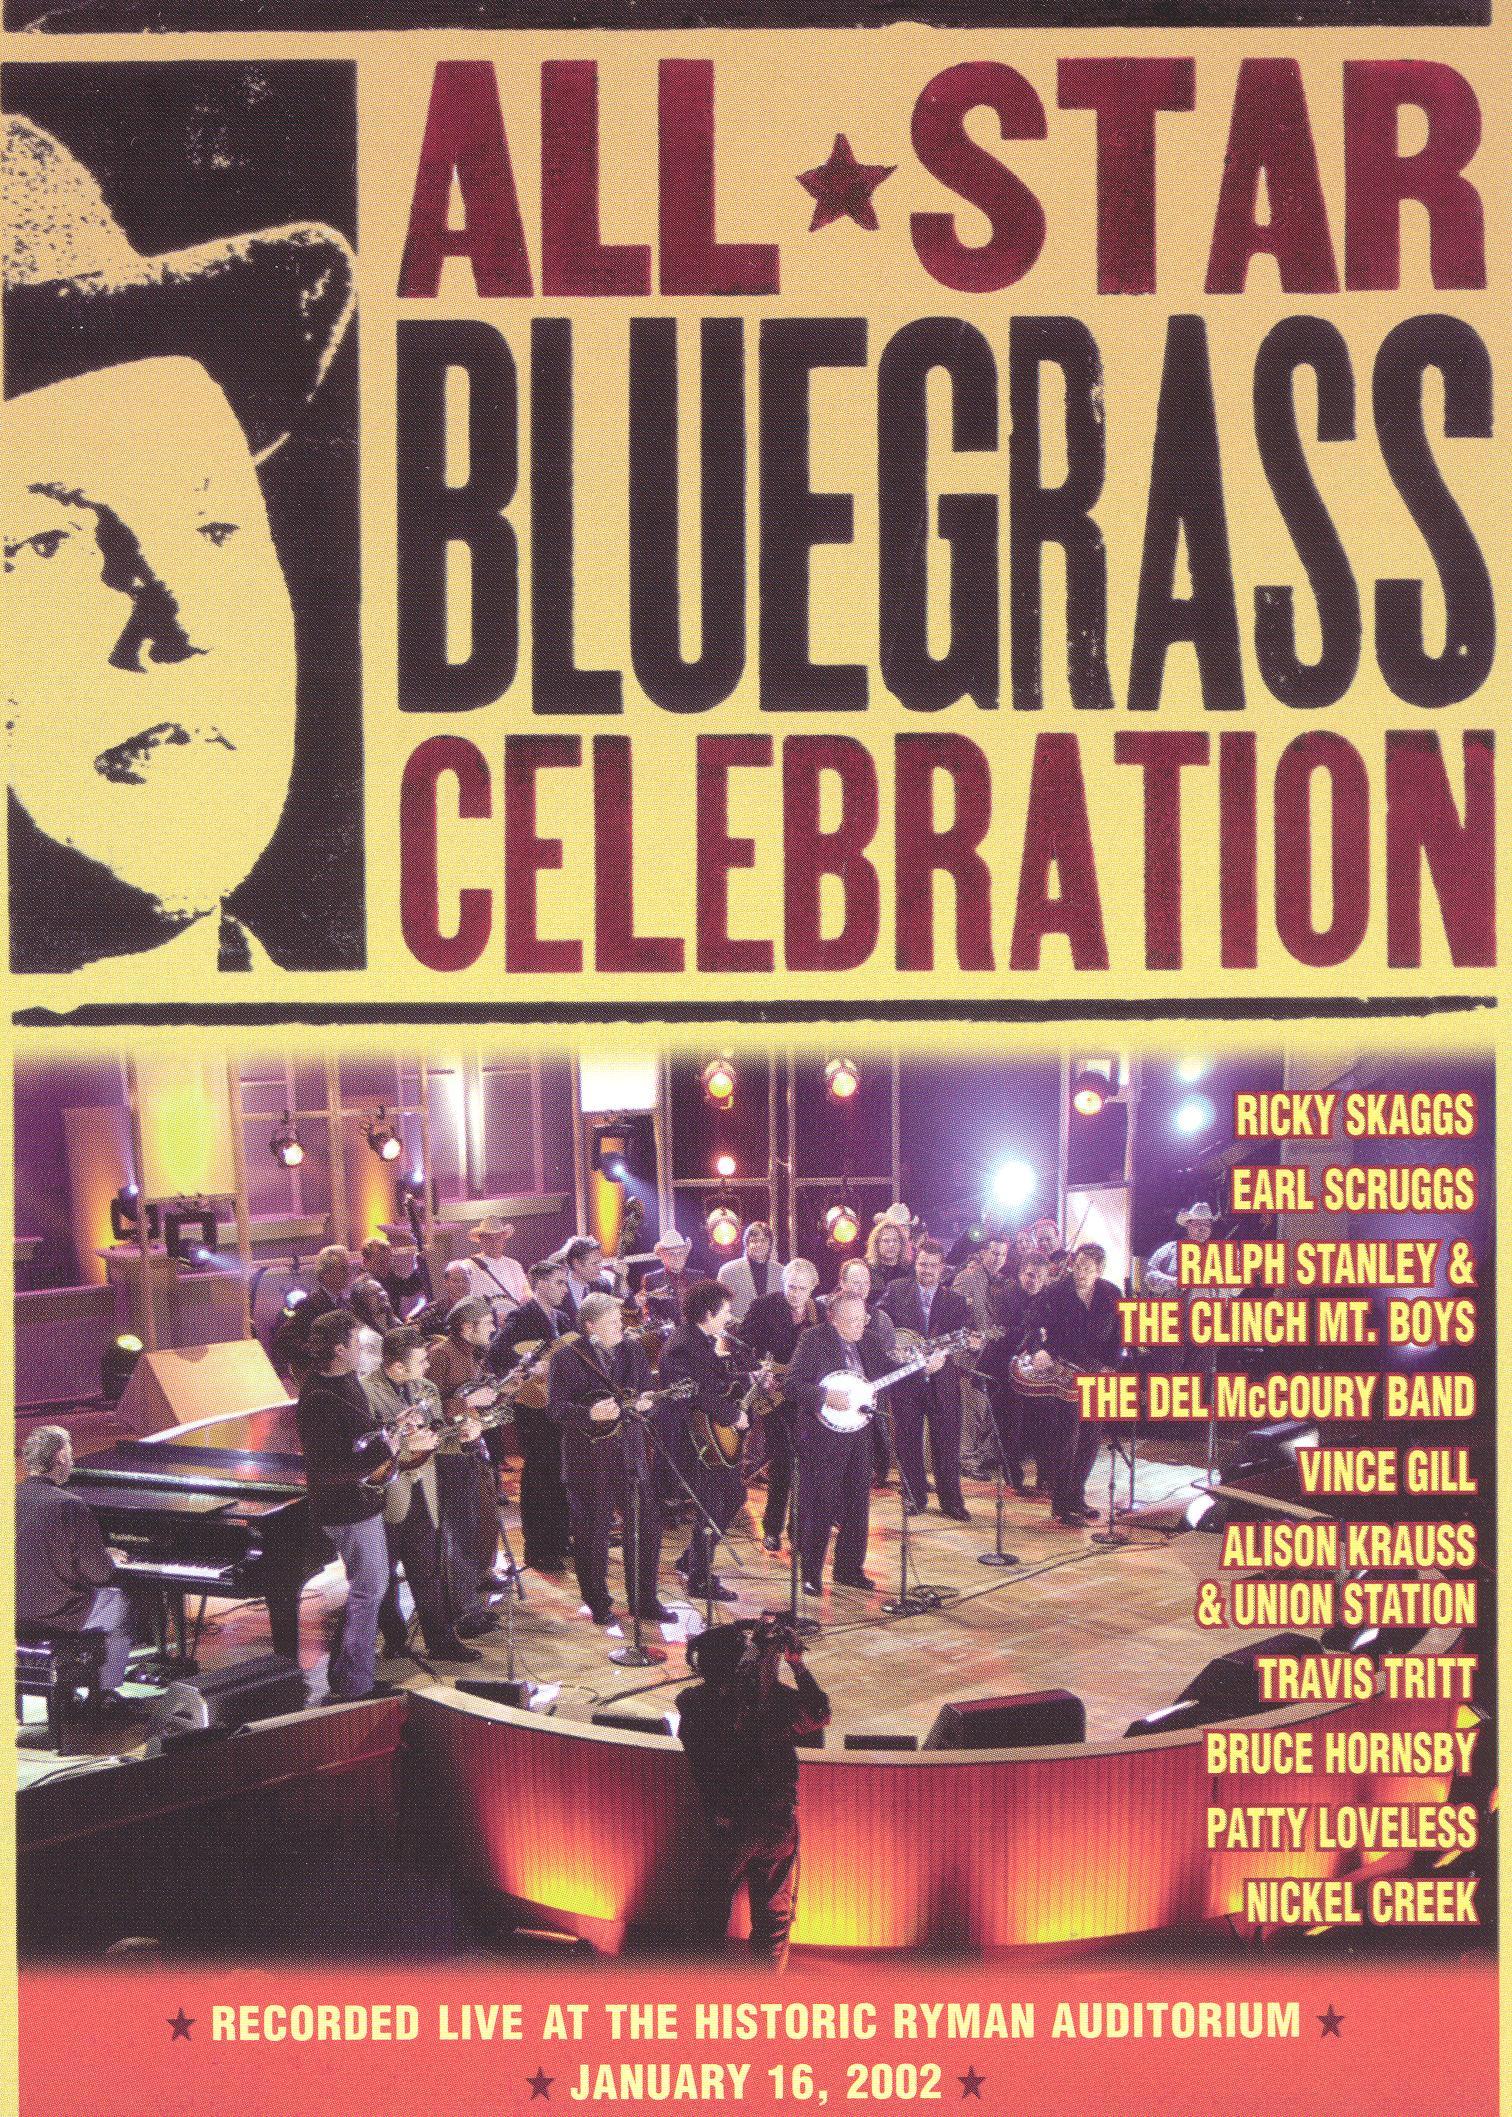 All-Star Bluegrass Celebration